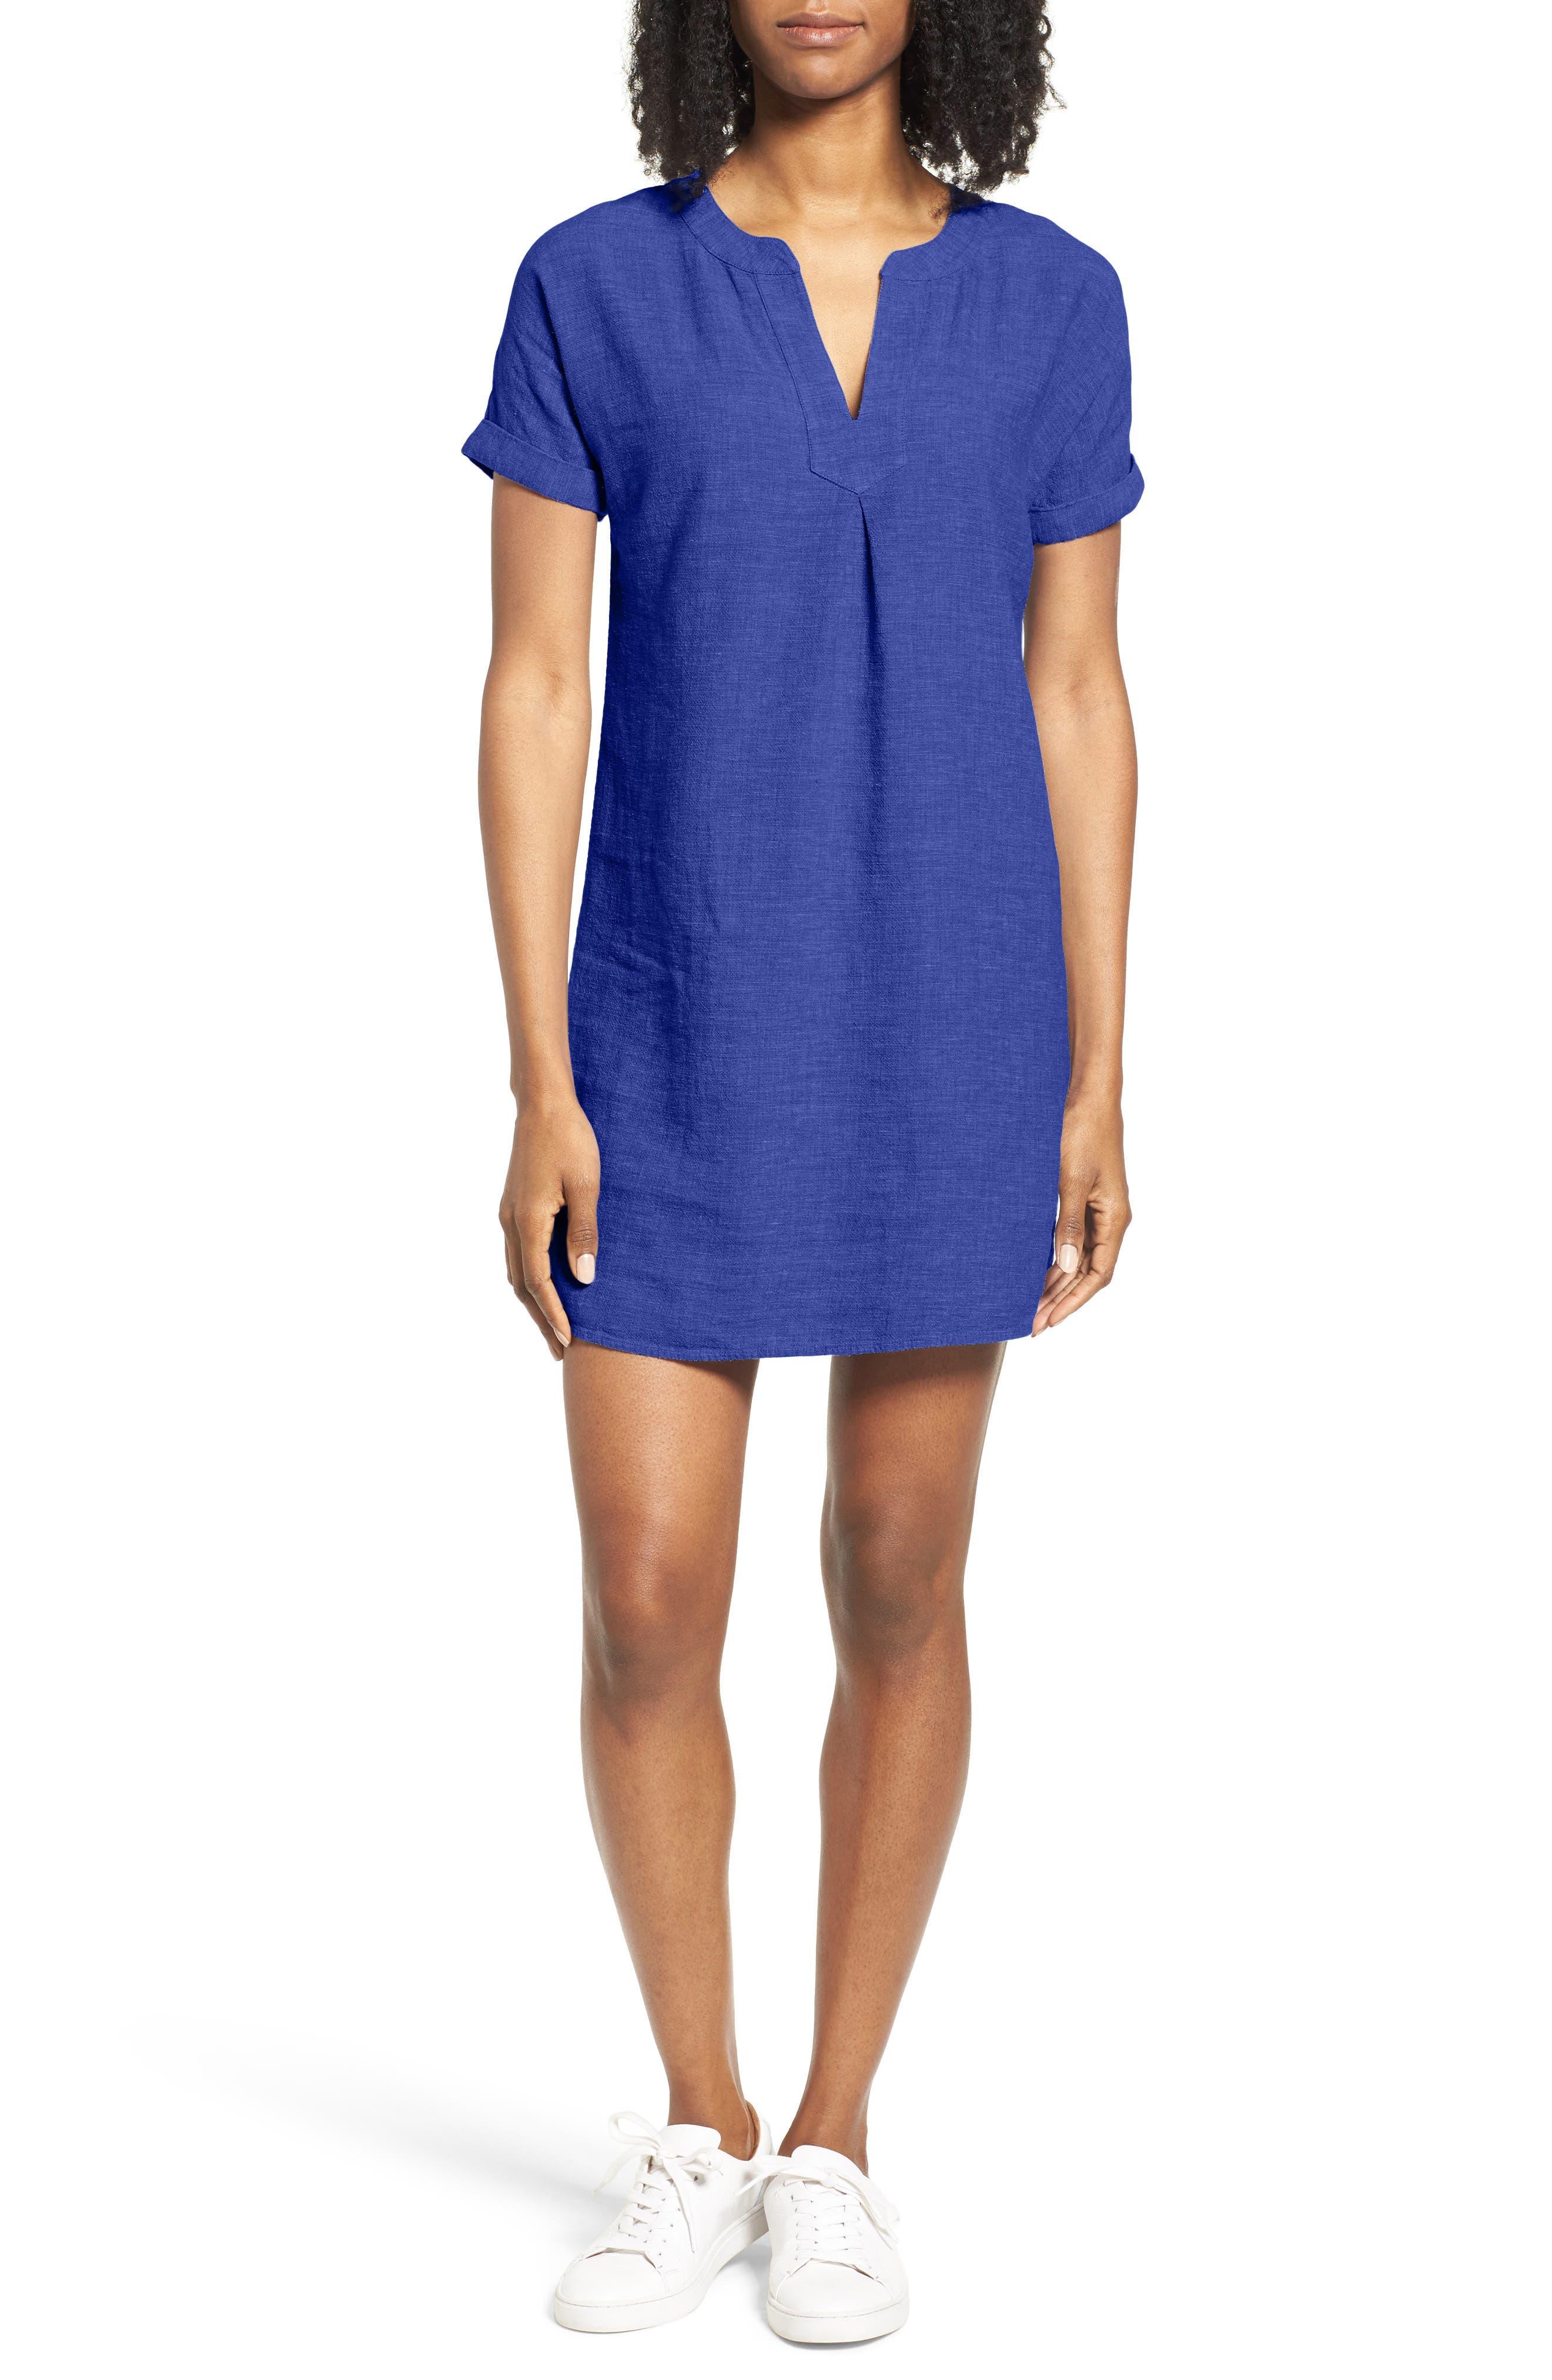 Alternate Image 1 Selected - Vineyard Vines Linen Blend Shirtdress